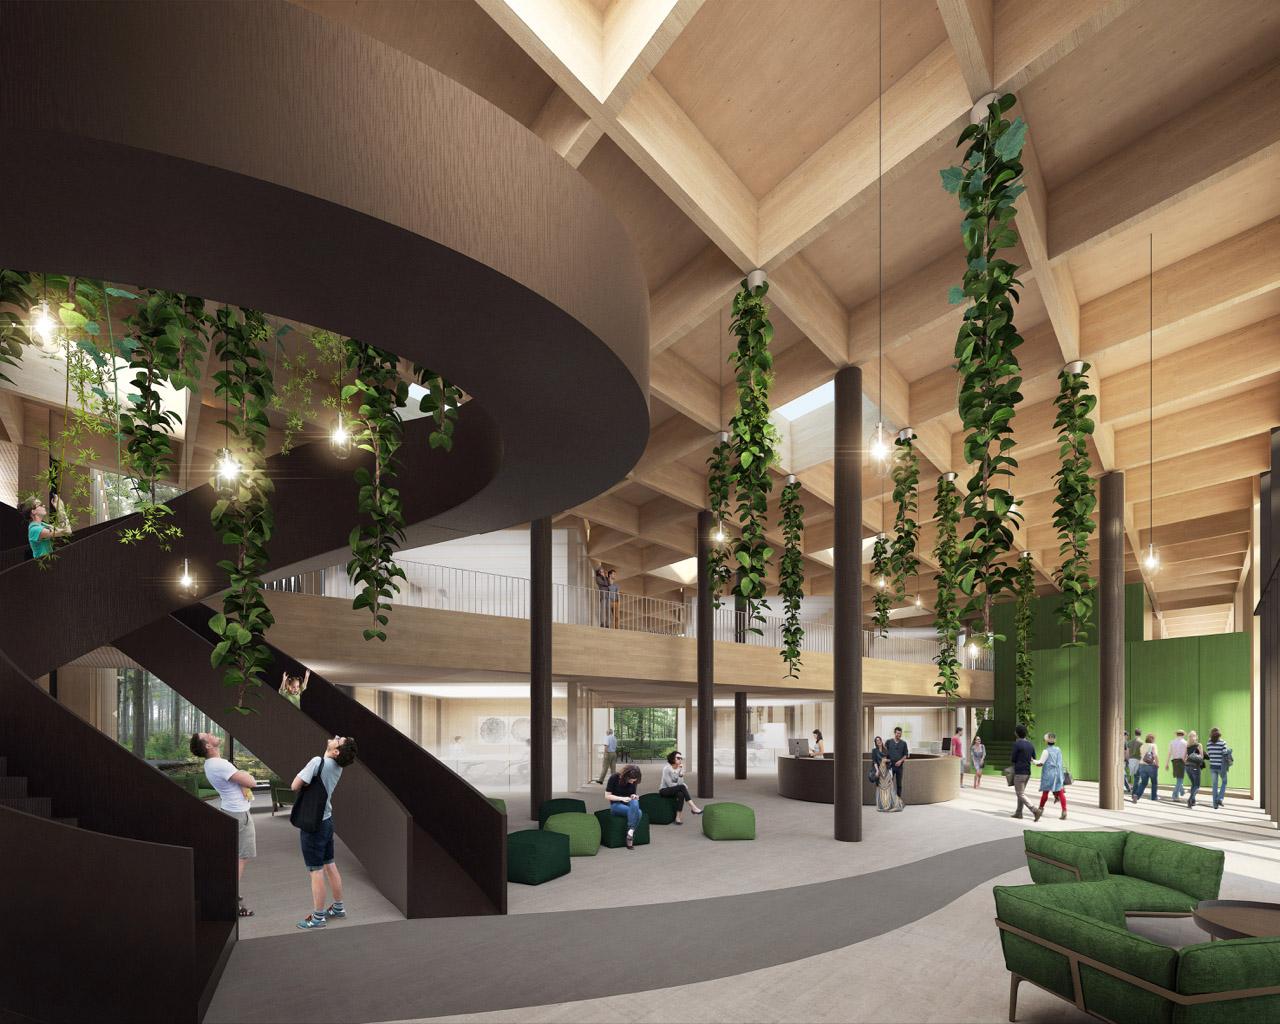 Chybik+Kristof Architects & Urban Designers_LesyCR_chybik_kristof_lcr_4